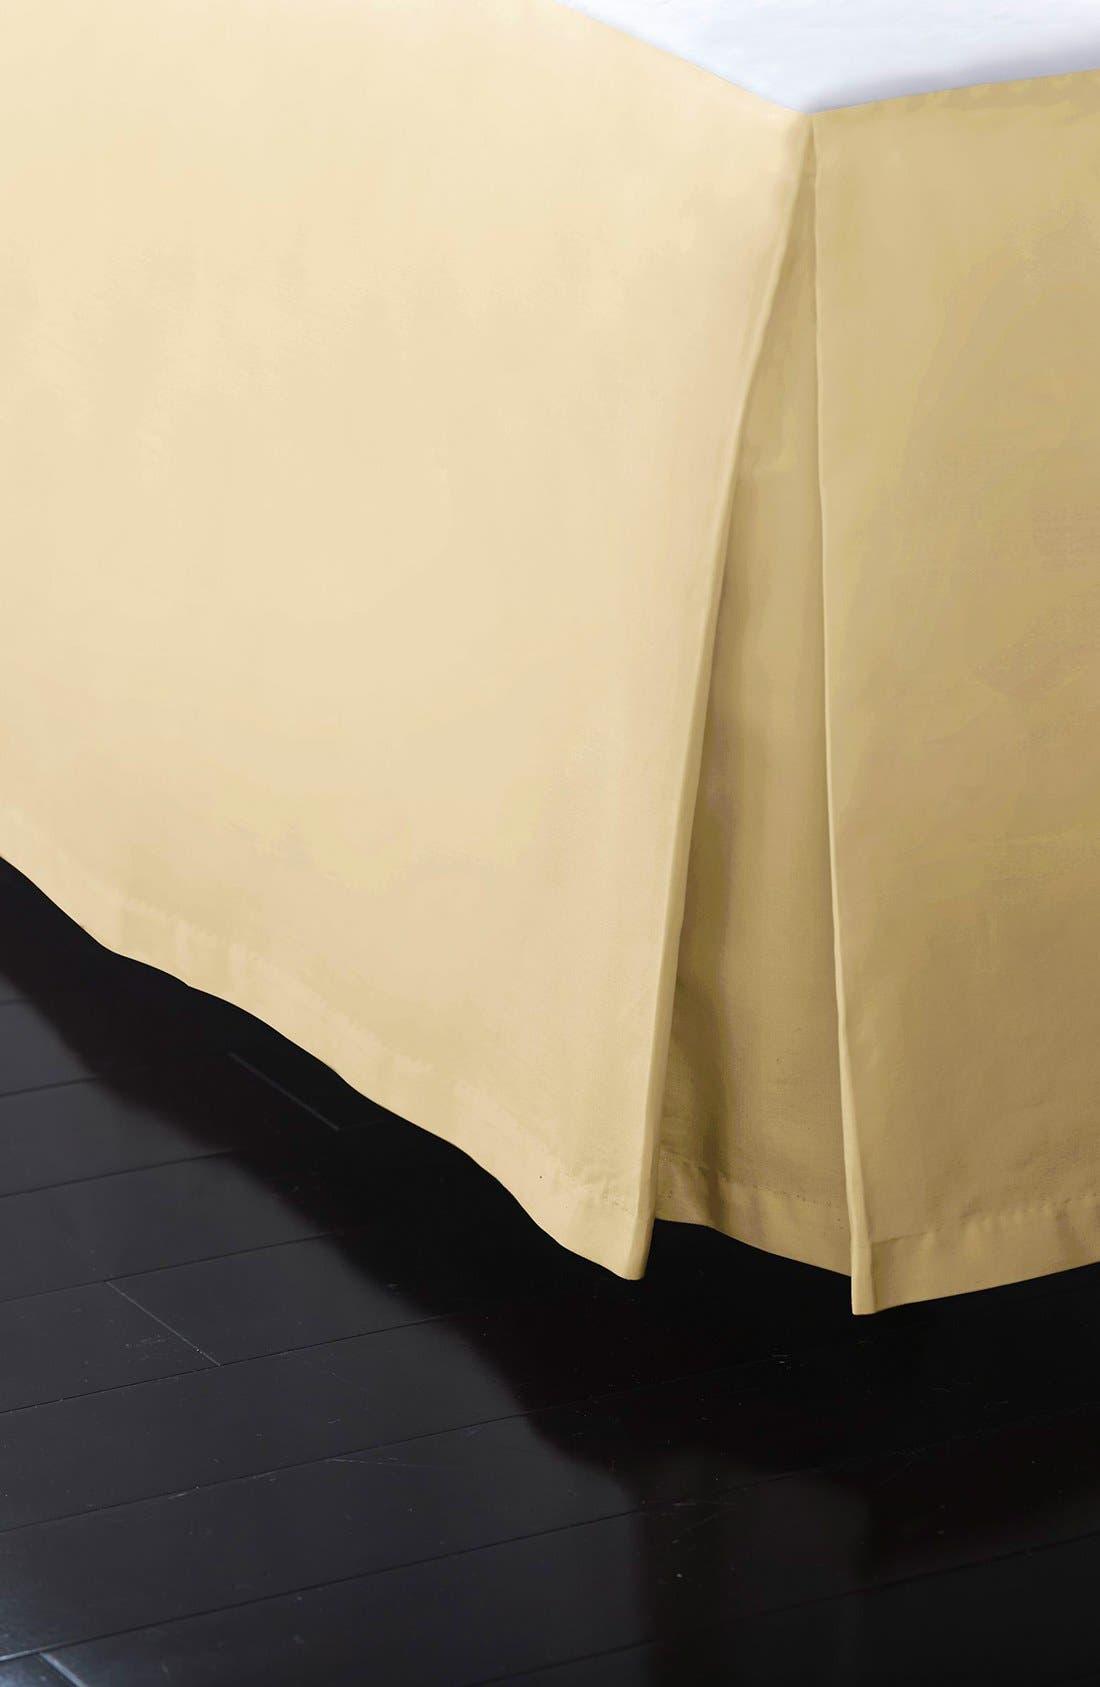 DONNA KARAN NEW YORK Donna Karan Collection 'Reflection' 510 Thread Count Bed Skirt, Main, color, GOLD DUST